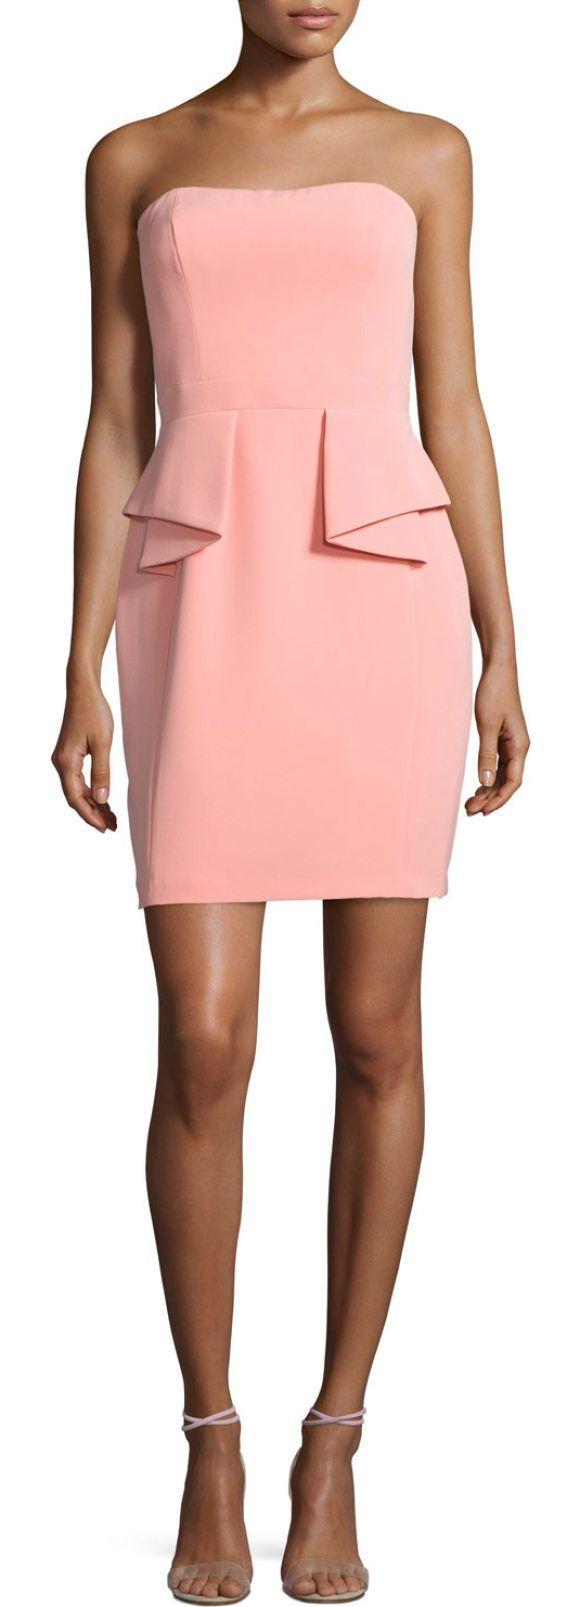 Mejores 39 imágenes de Party Dresses en Pinterest | Vestidos de ...